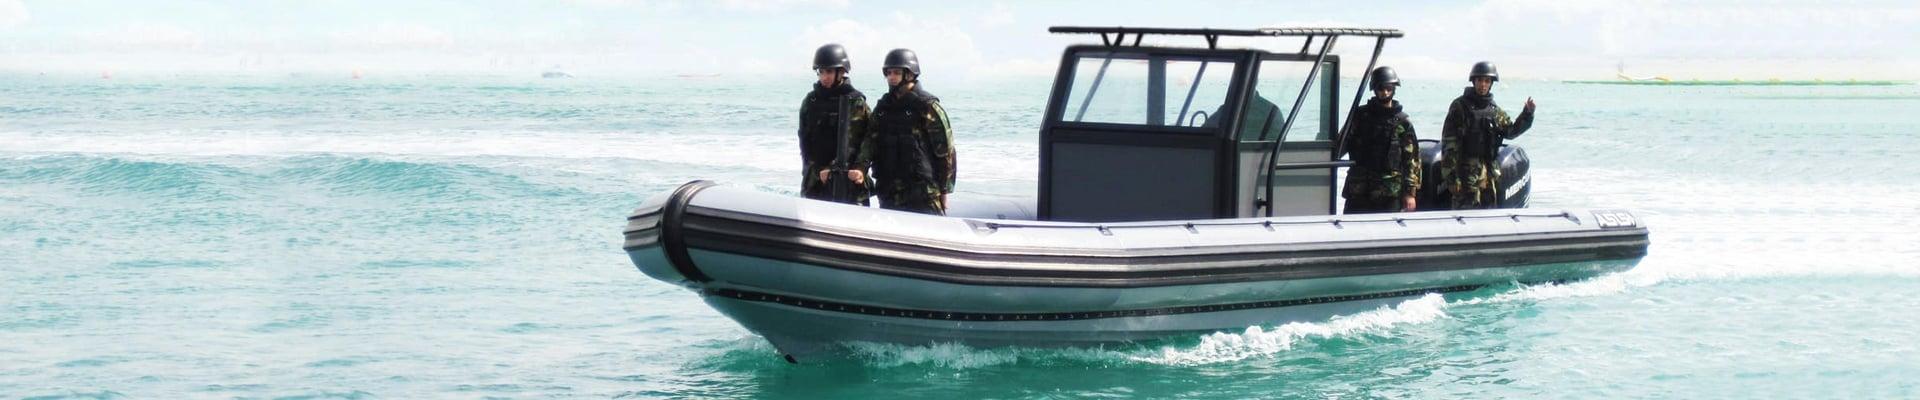 Asis-boats-Riverine-Boats